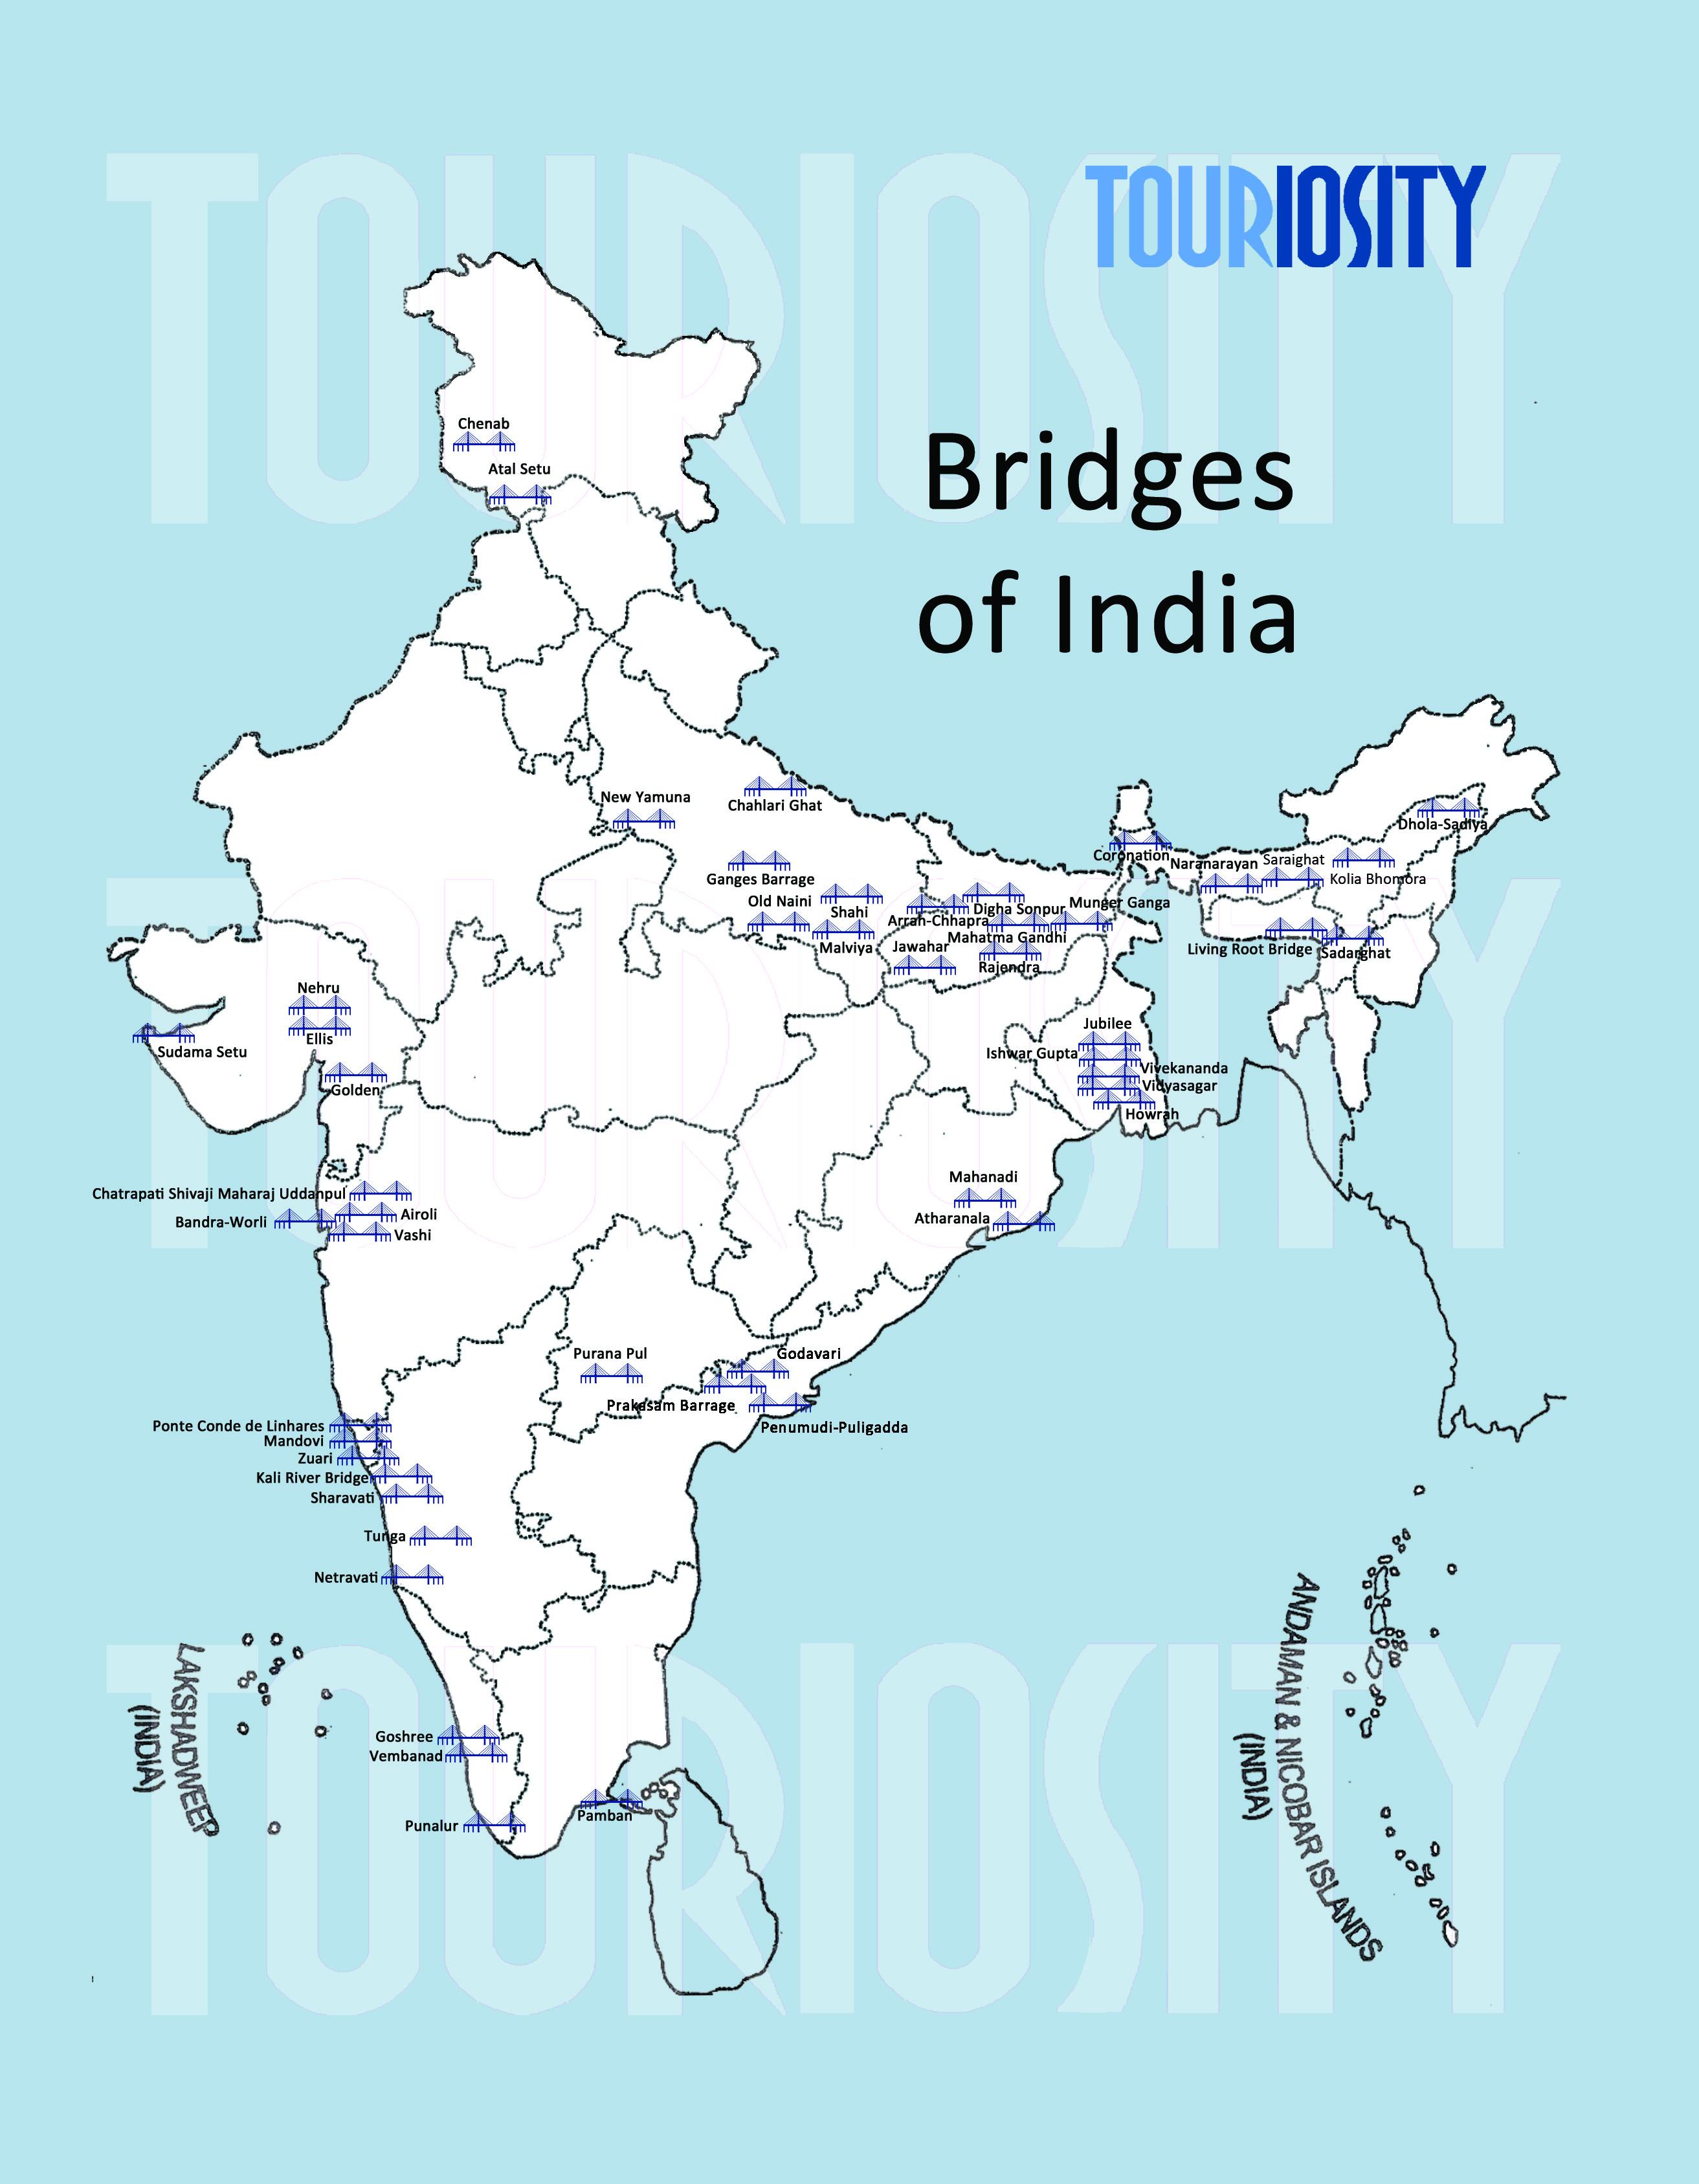 'Must See' Bridges in India